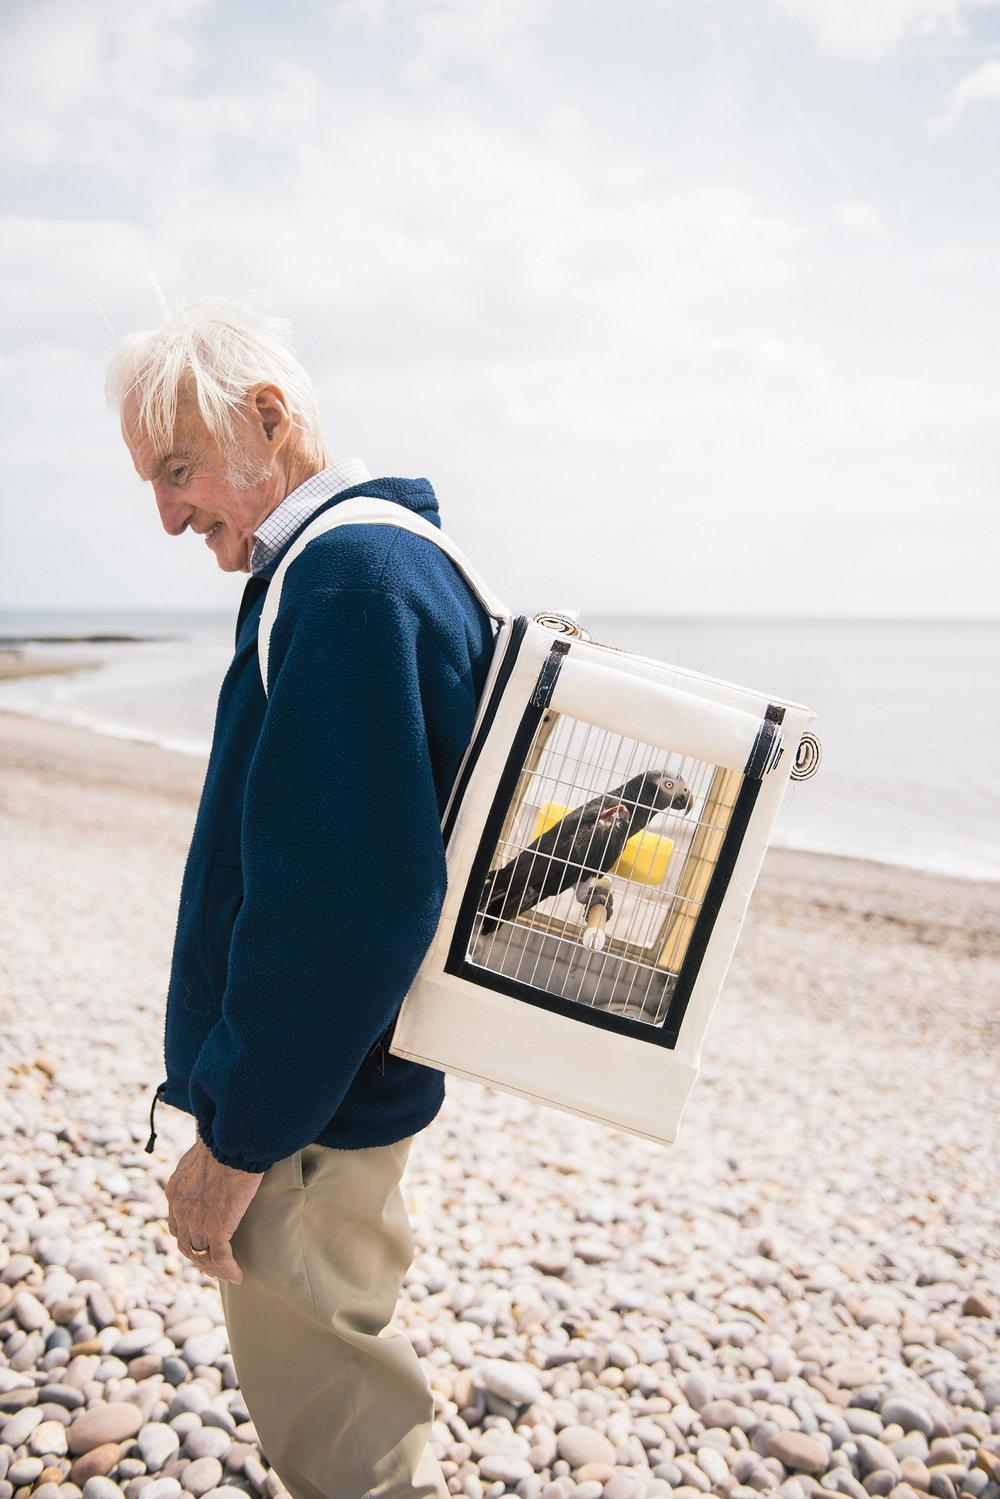 Final Alex Fleming Portrait Of Britain | 300DPI.jpg